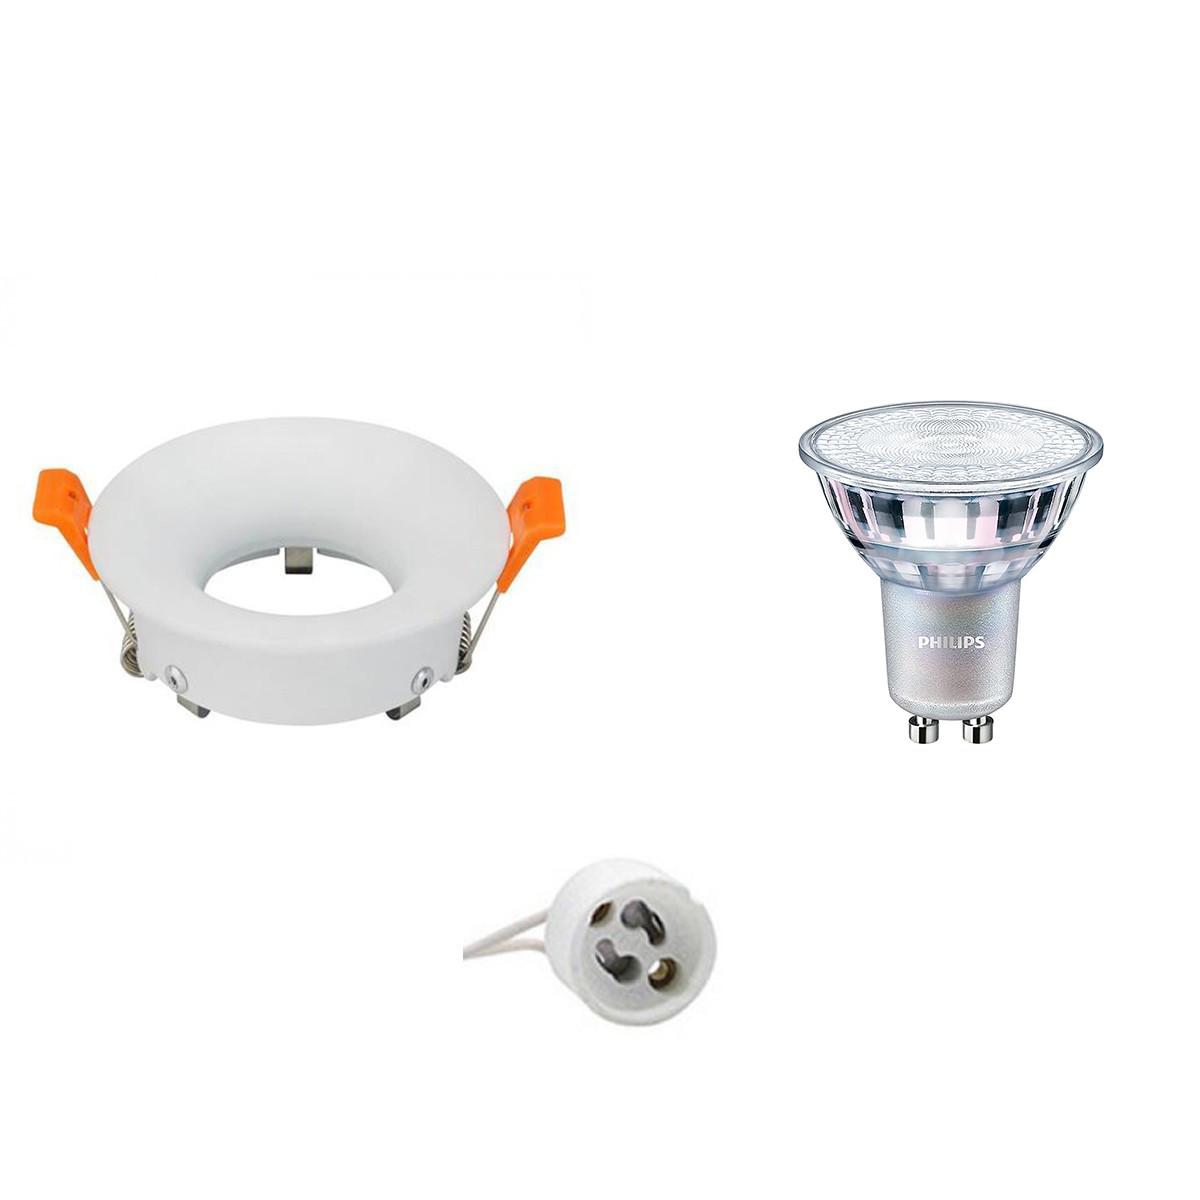 PHILIPS - LED Spot Set - MASTER 927 36D VLE - GU10 Fitting - DimTone Dimbaar - Inbouw Rond - Mat Wit